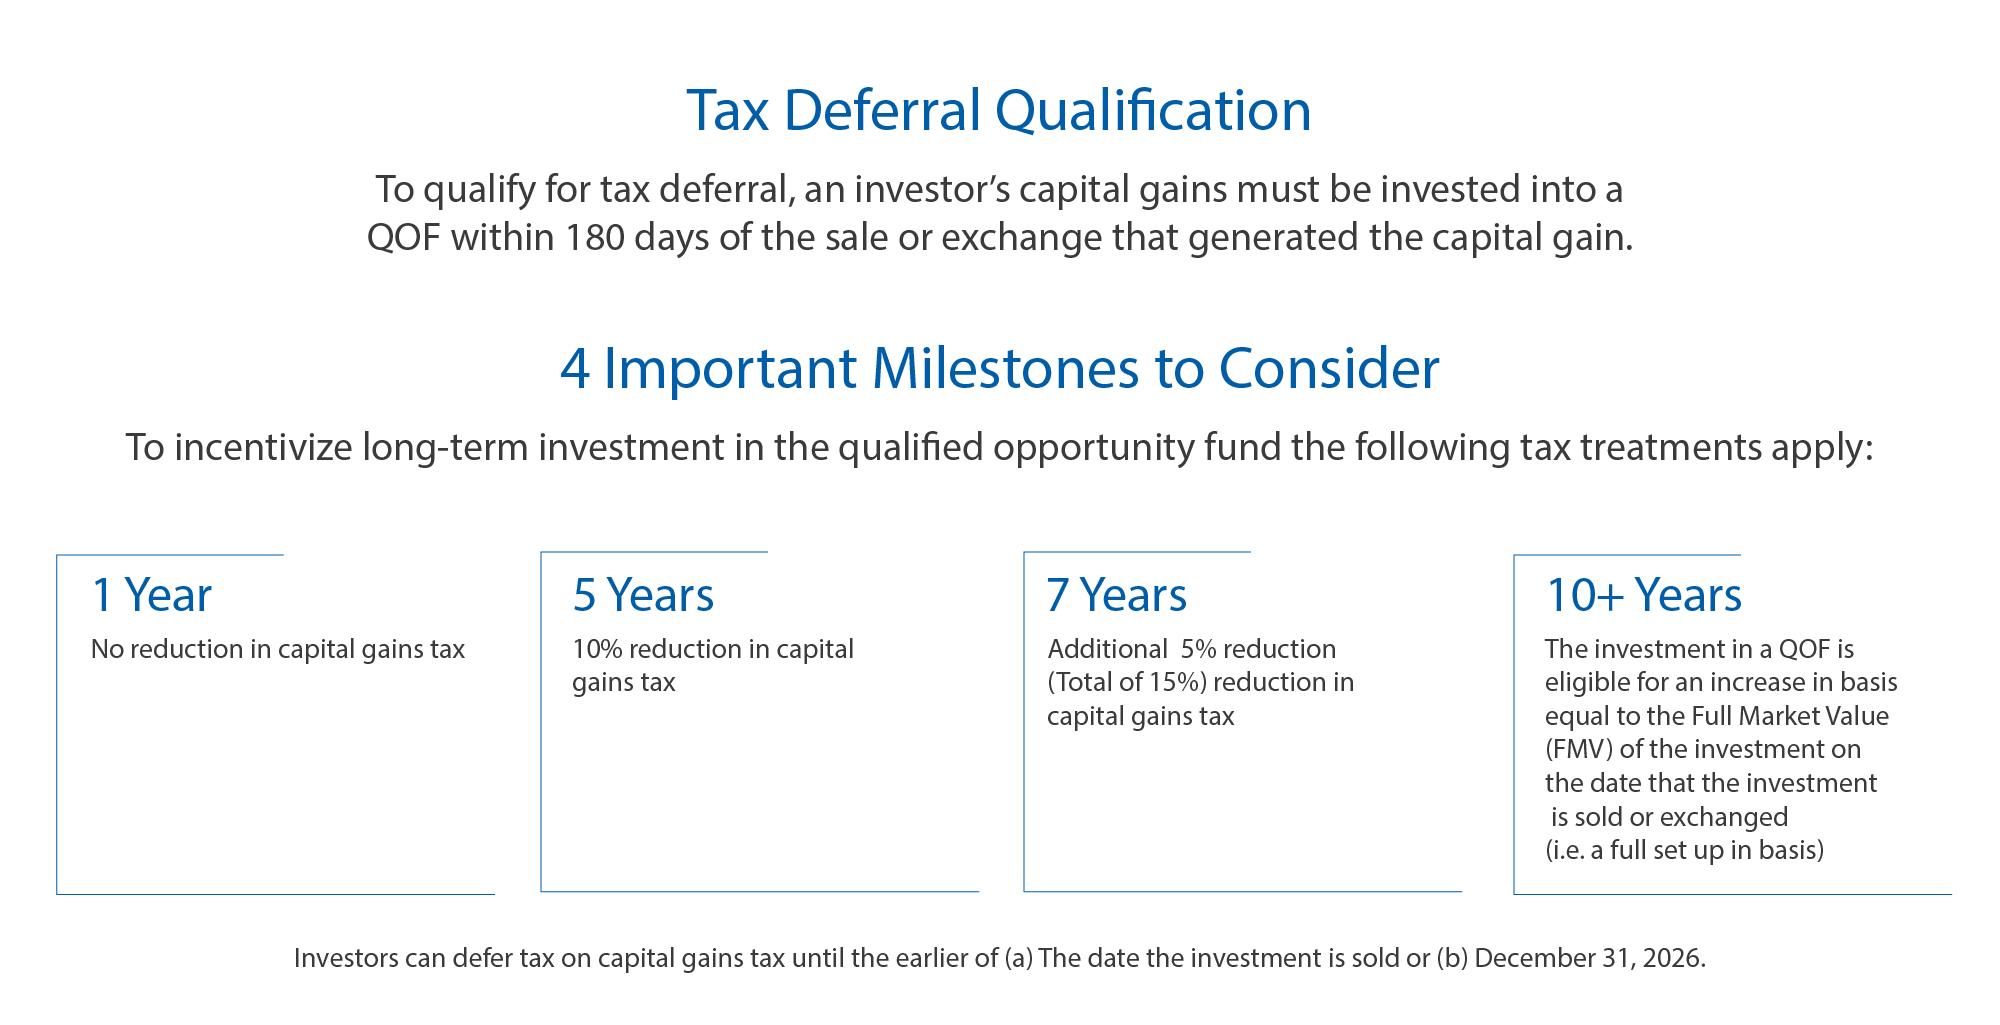 QOF-Tax-Deferral-Qualification.jpg